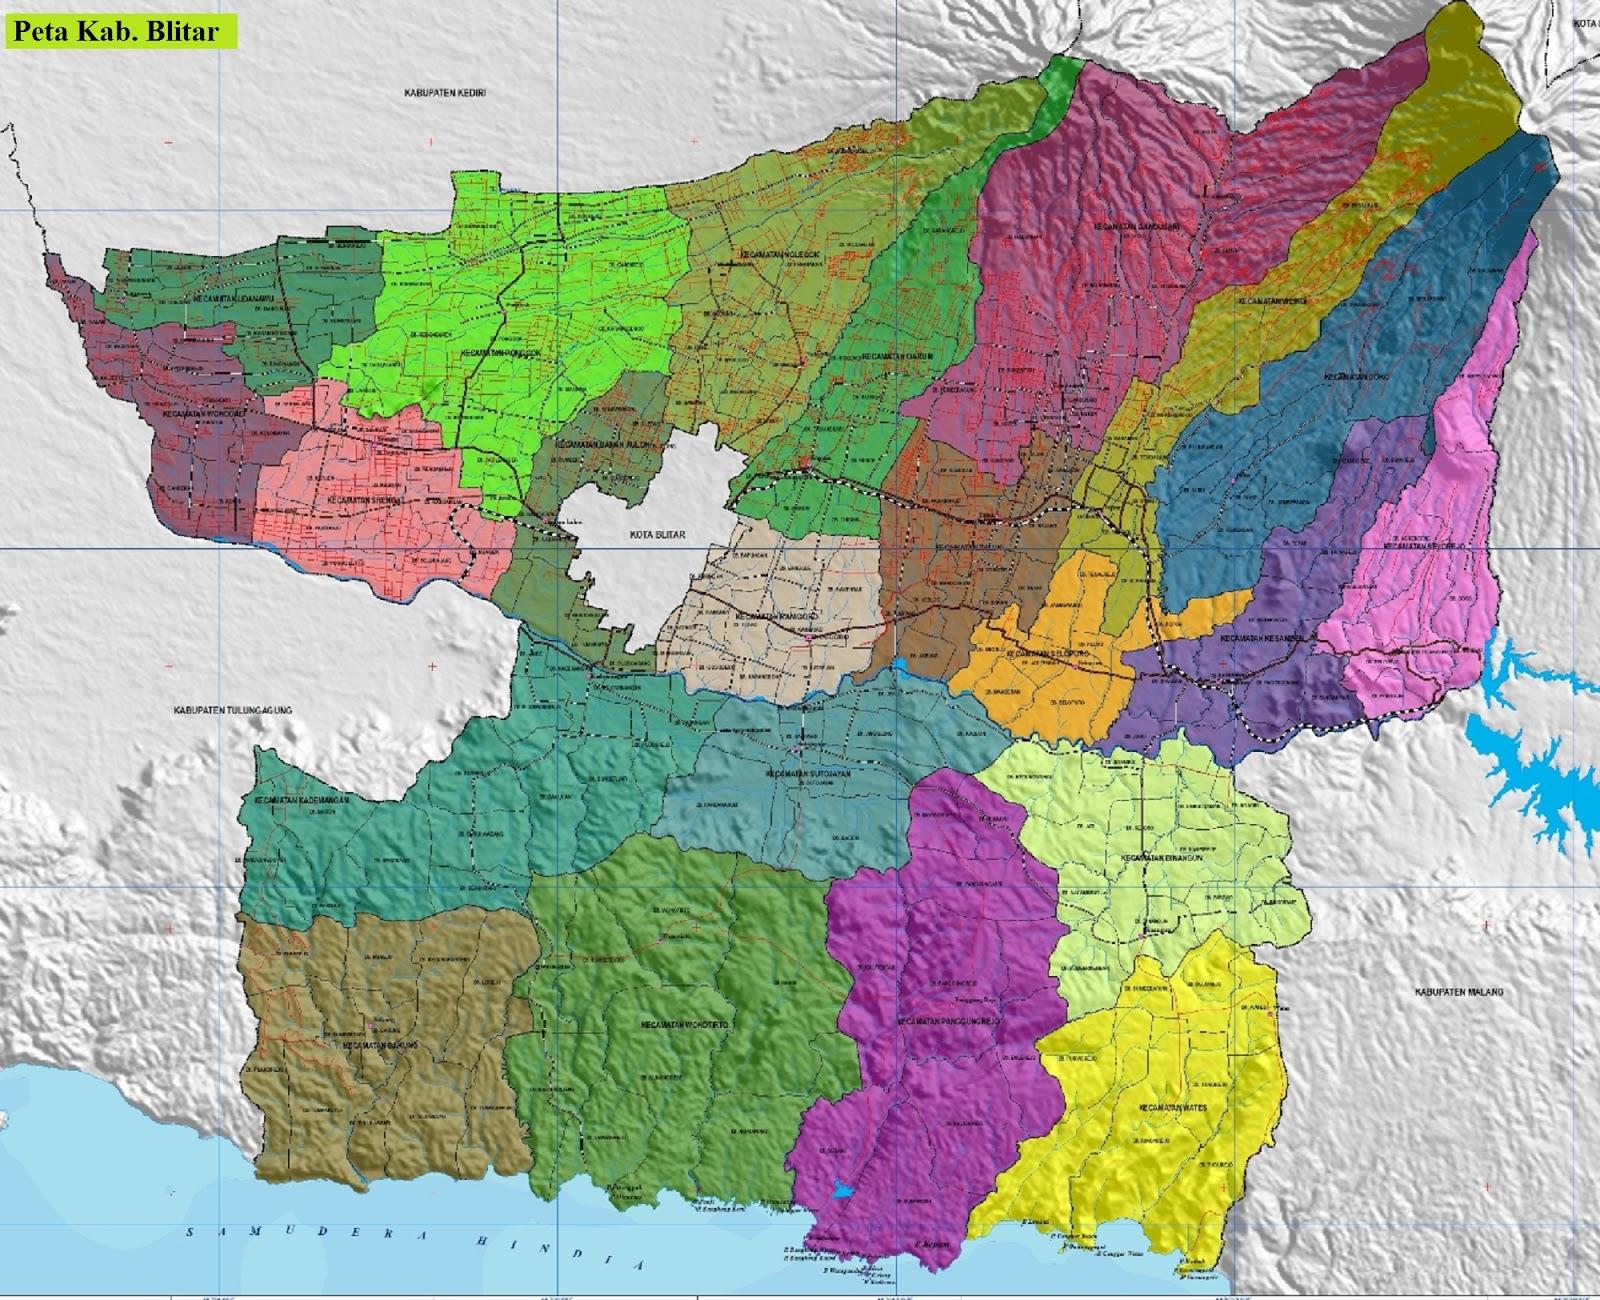 Peta Kabupaten Blitar